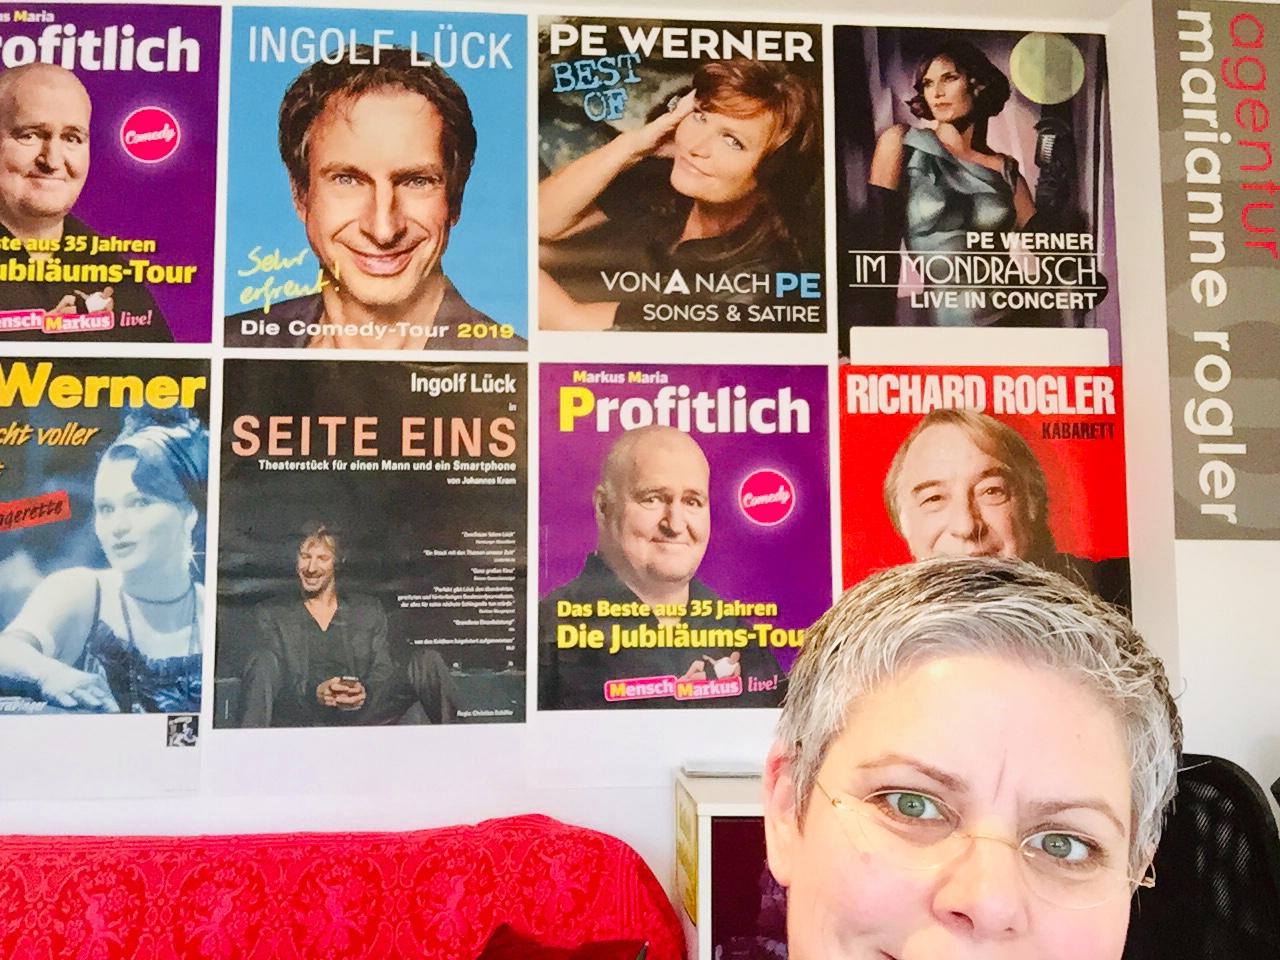 Der Erntehelfer Podcast - Folge 06 - Marianne Rogler - Künstler Agentin